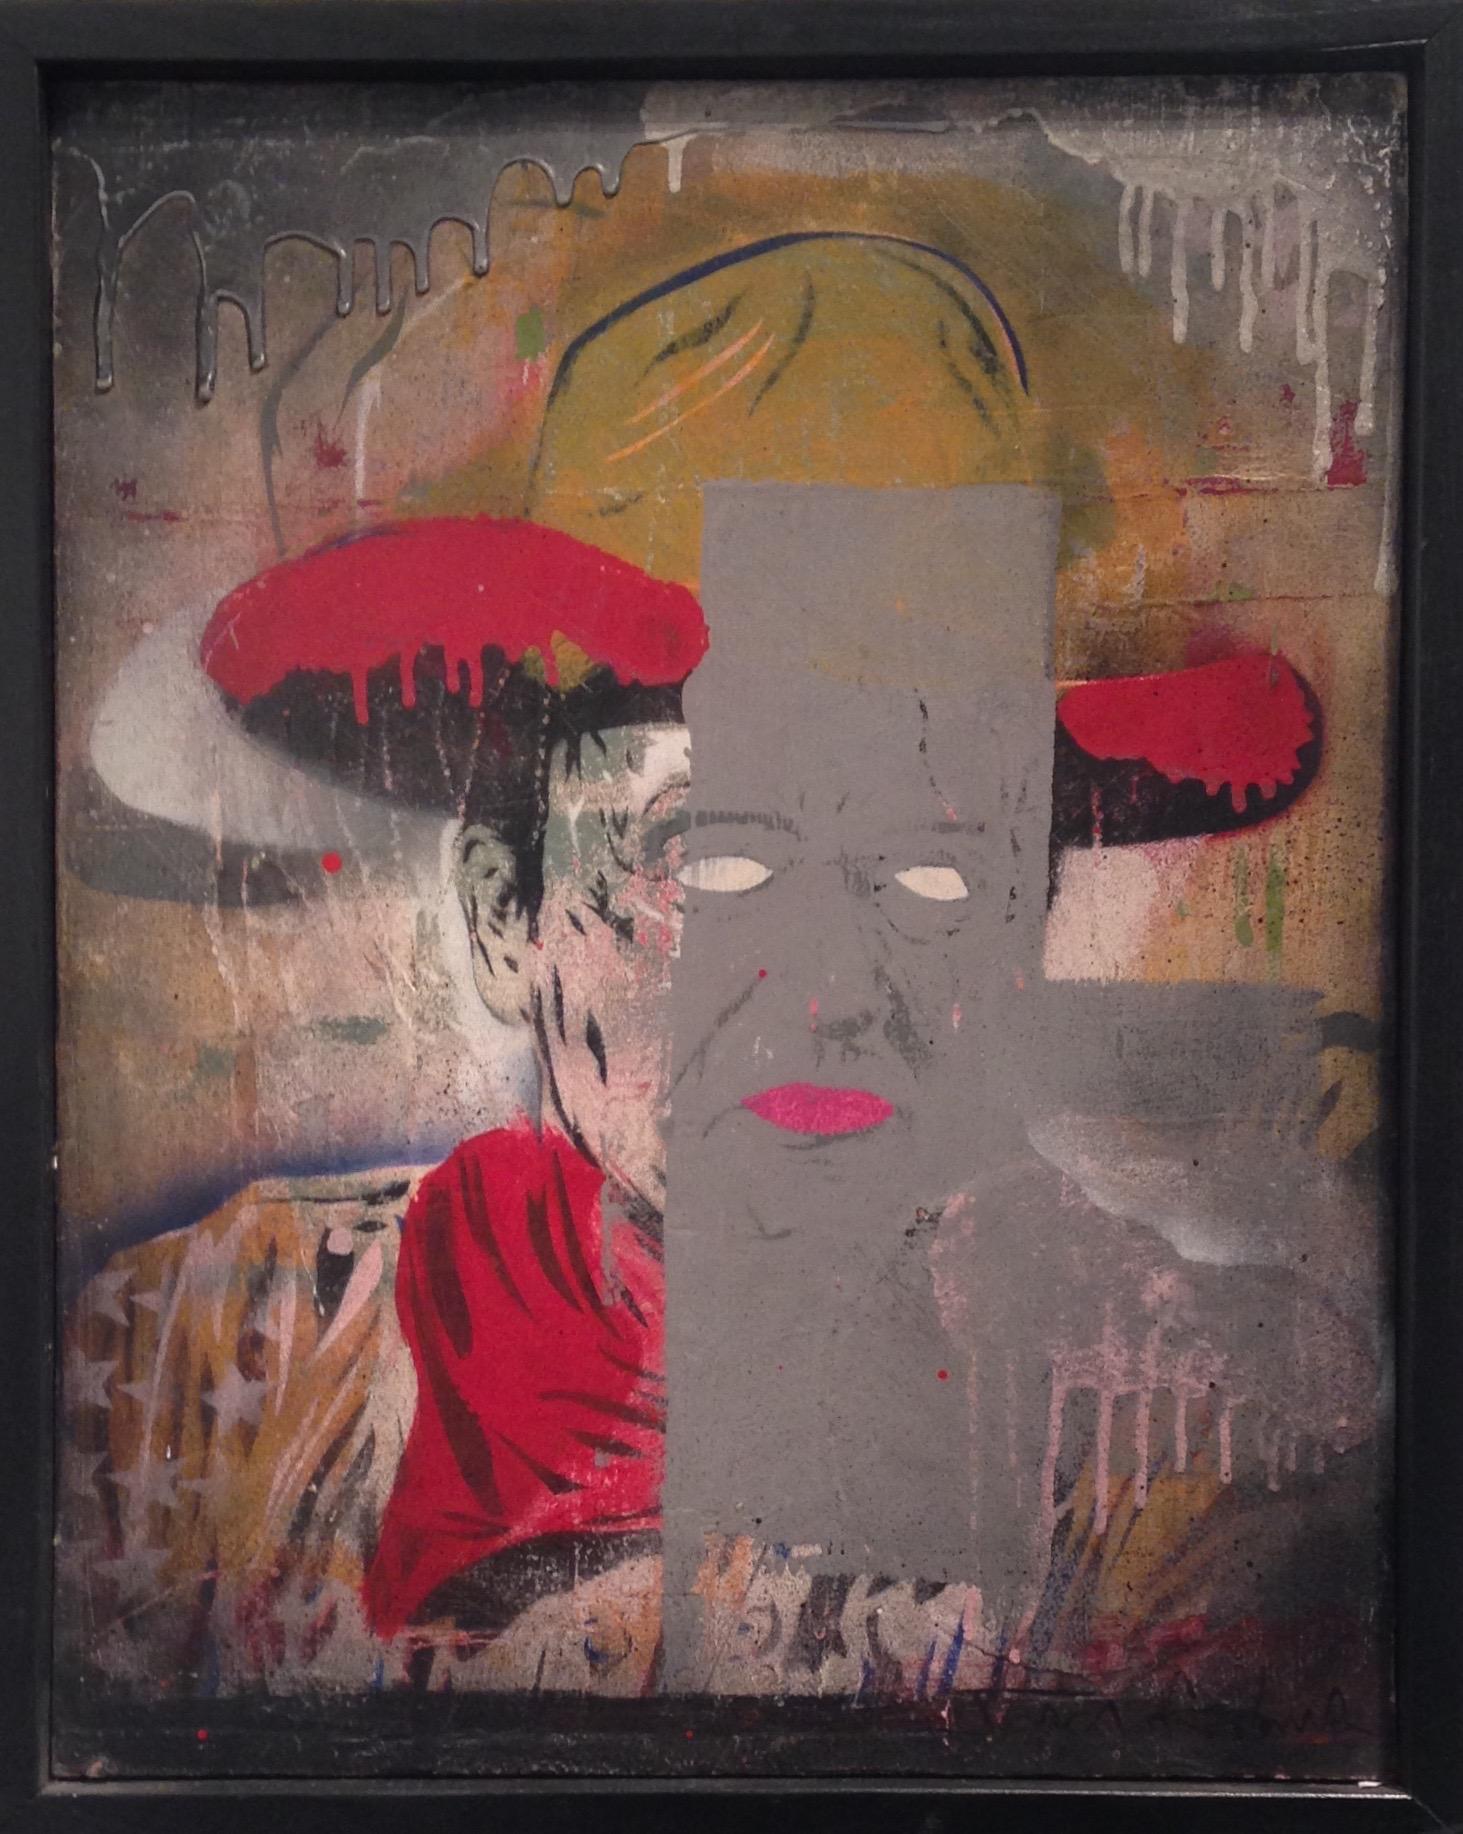 """JOHN"" 16""x20"" stencil, aerosol, latex paint on wood panel $450"